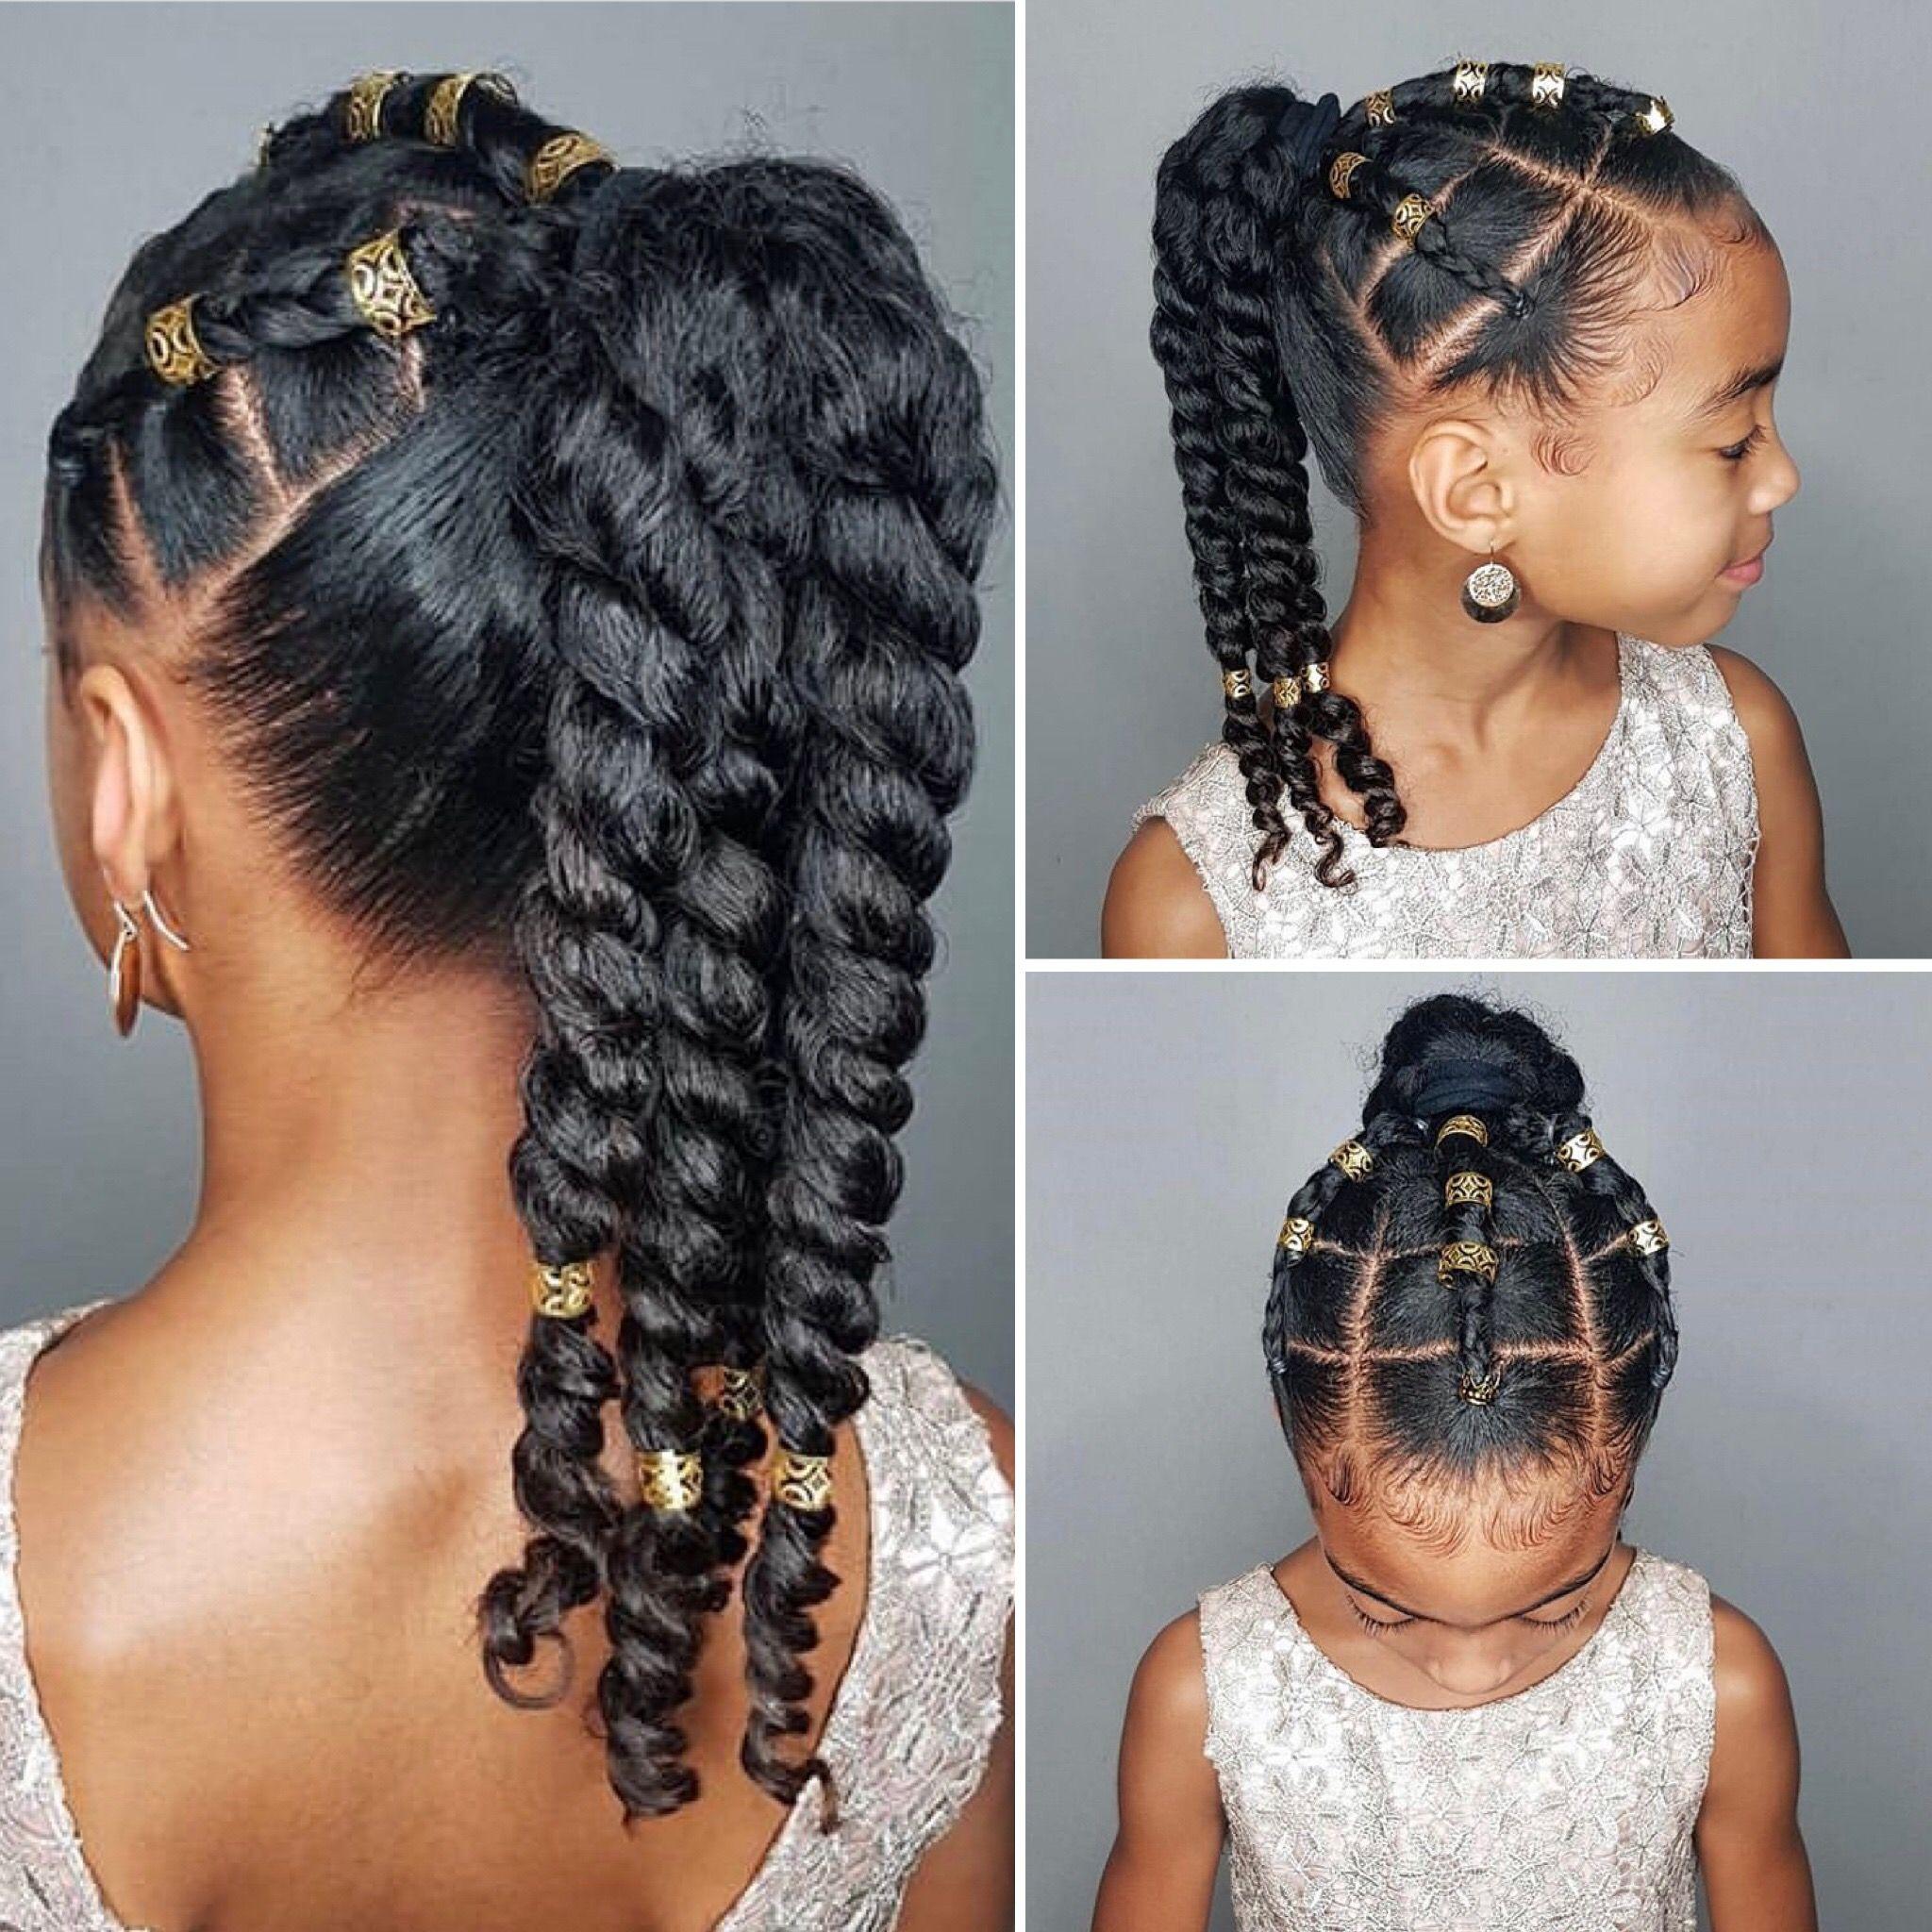 Riityeyayeѕt Eurodolls With Images Girls Natural Hairstyles